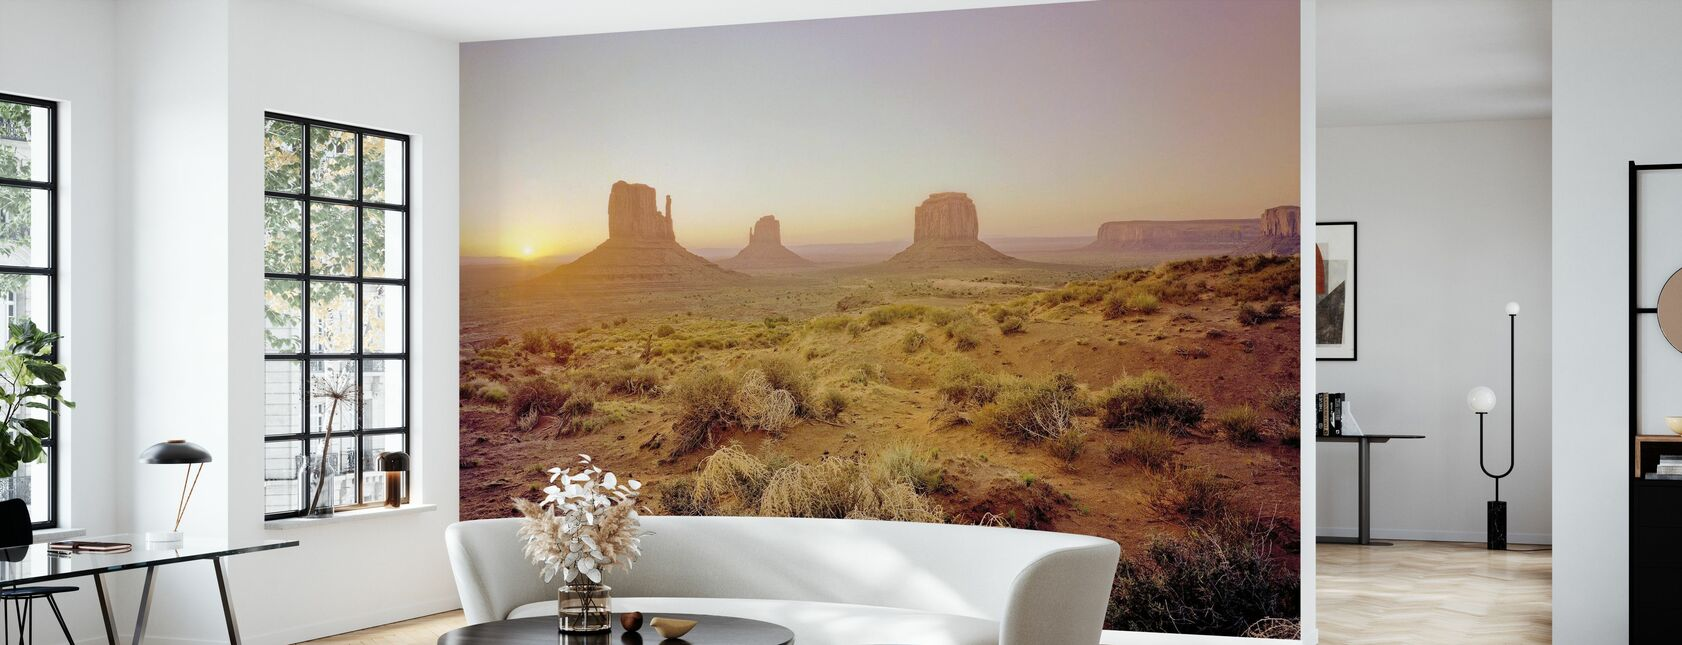 Daggry i ørkenen - Tapet - Stue